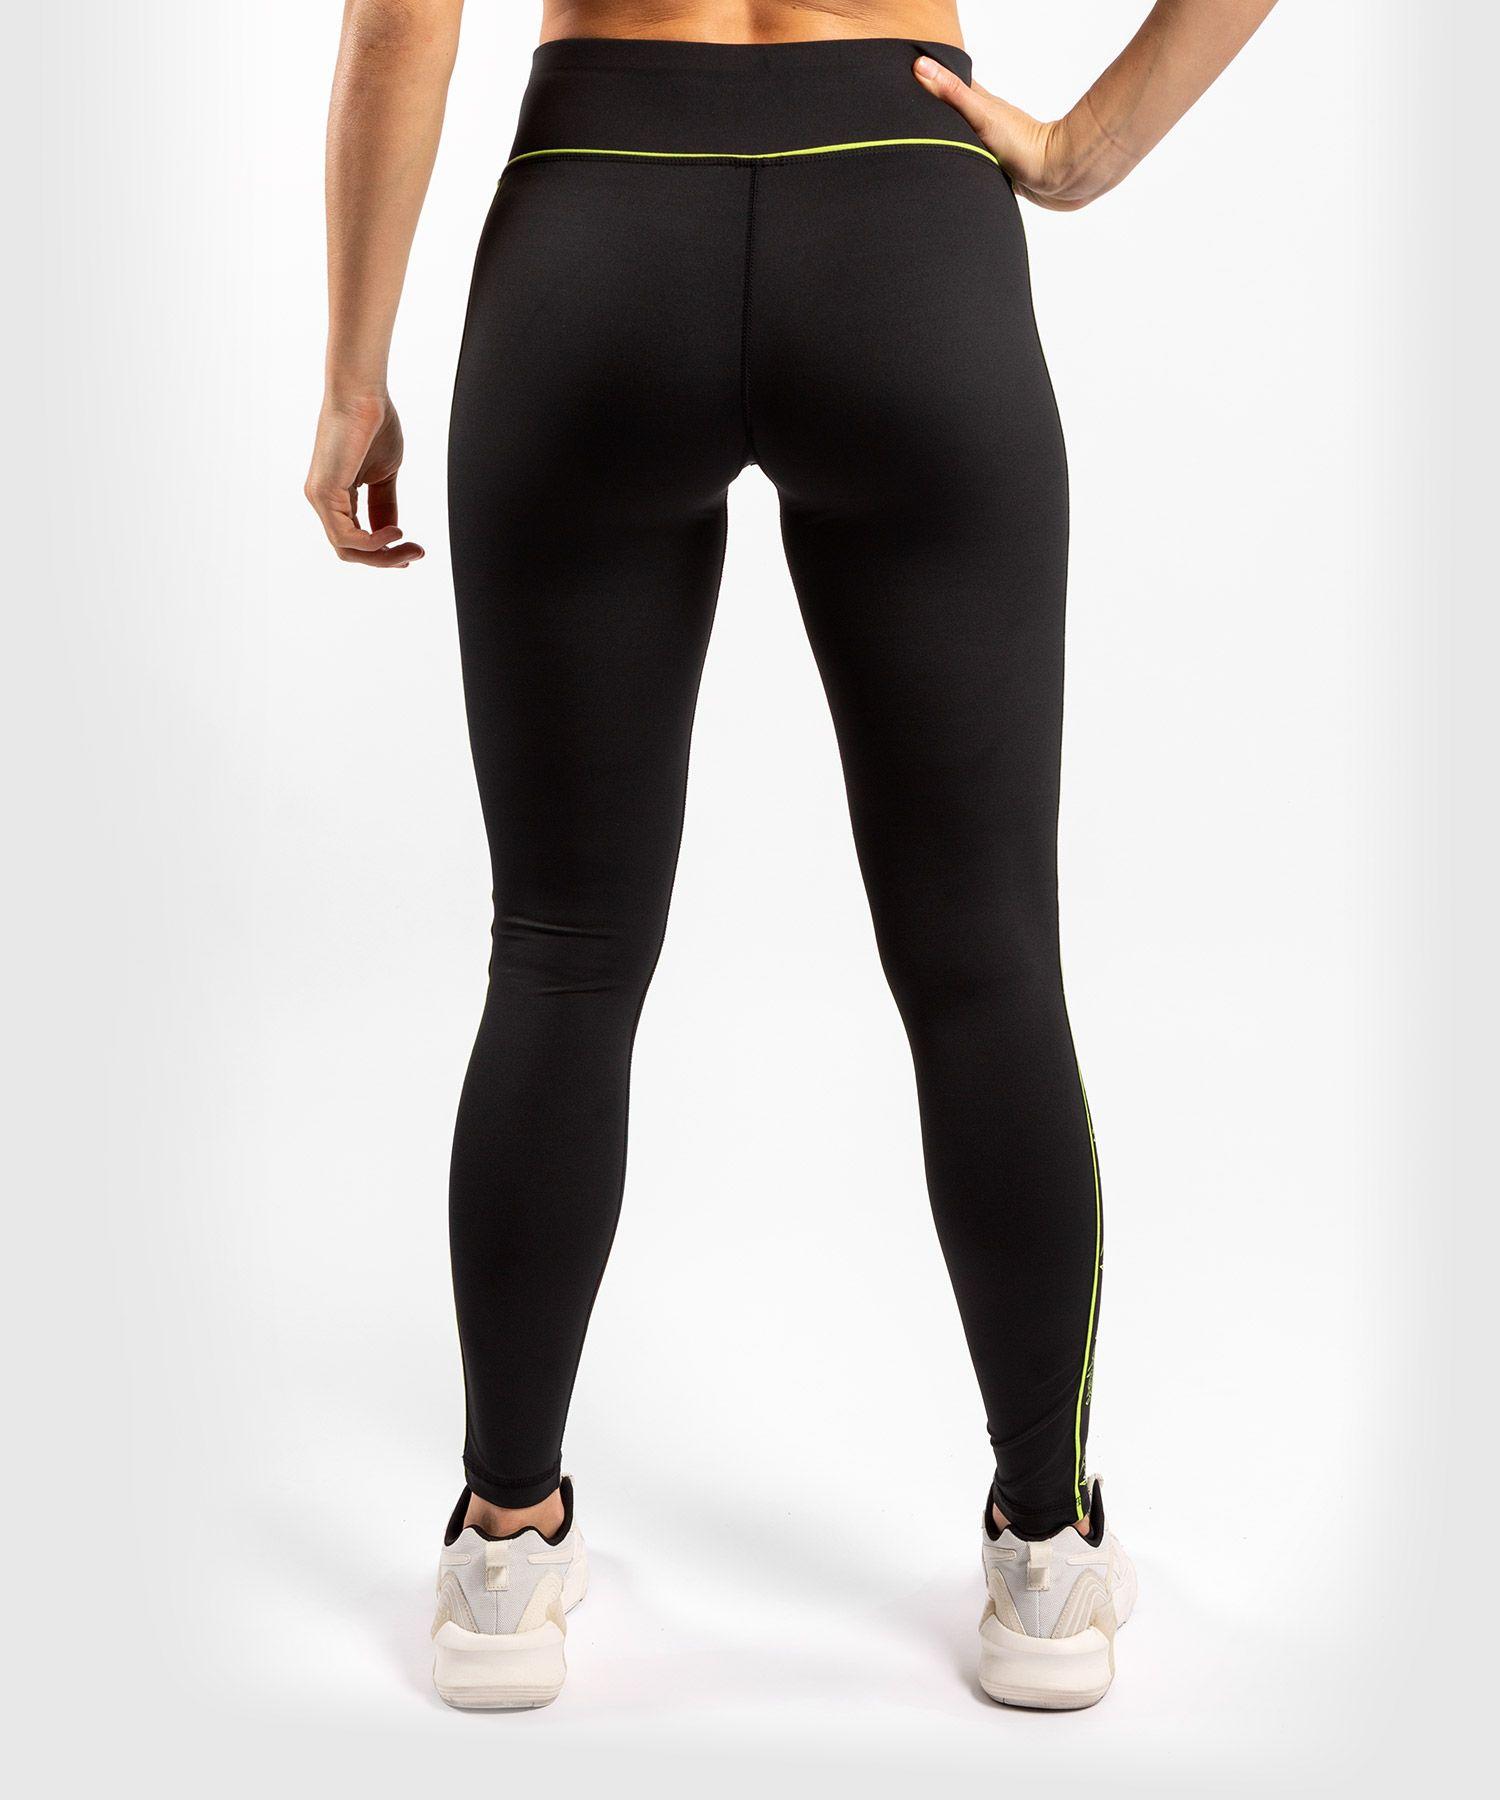 Venum Tecmo Leggings - For Women - Black/Neo Yellow